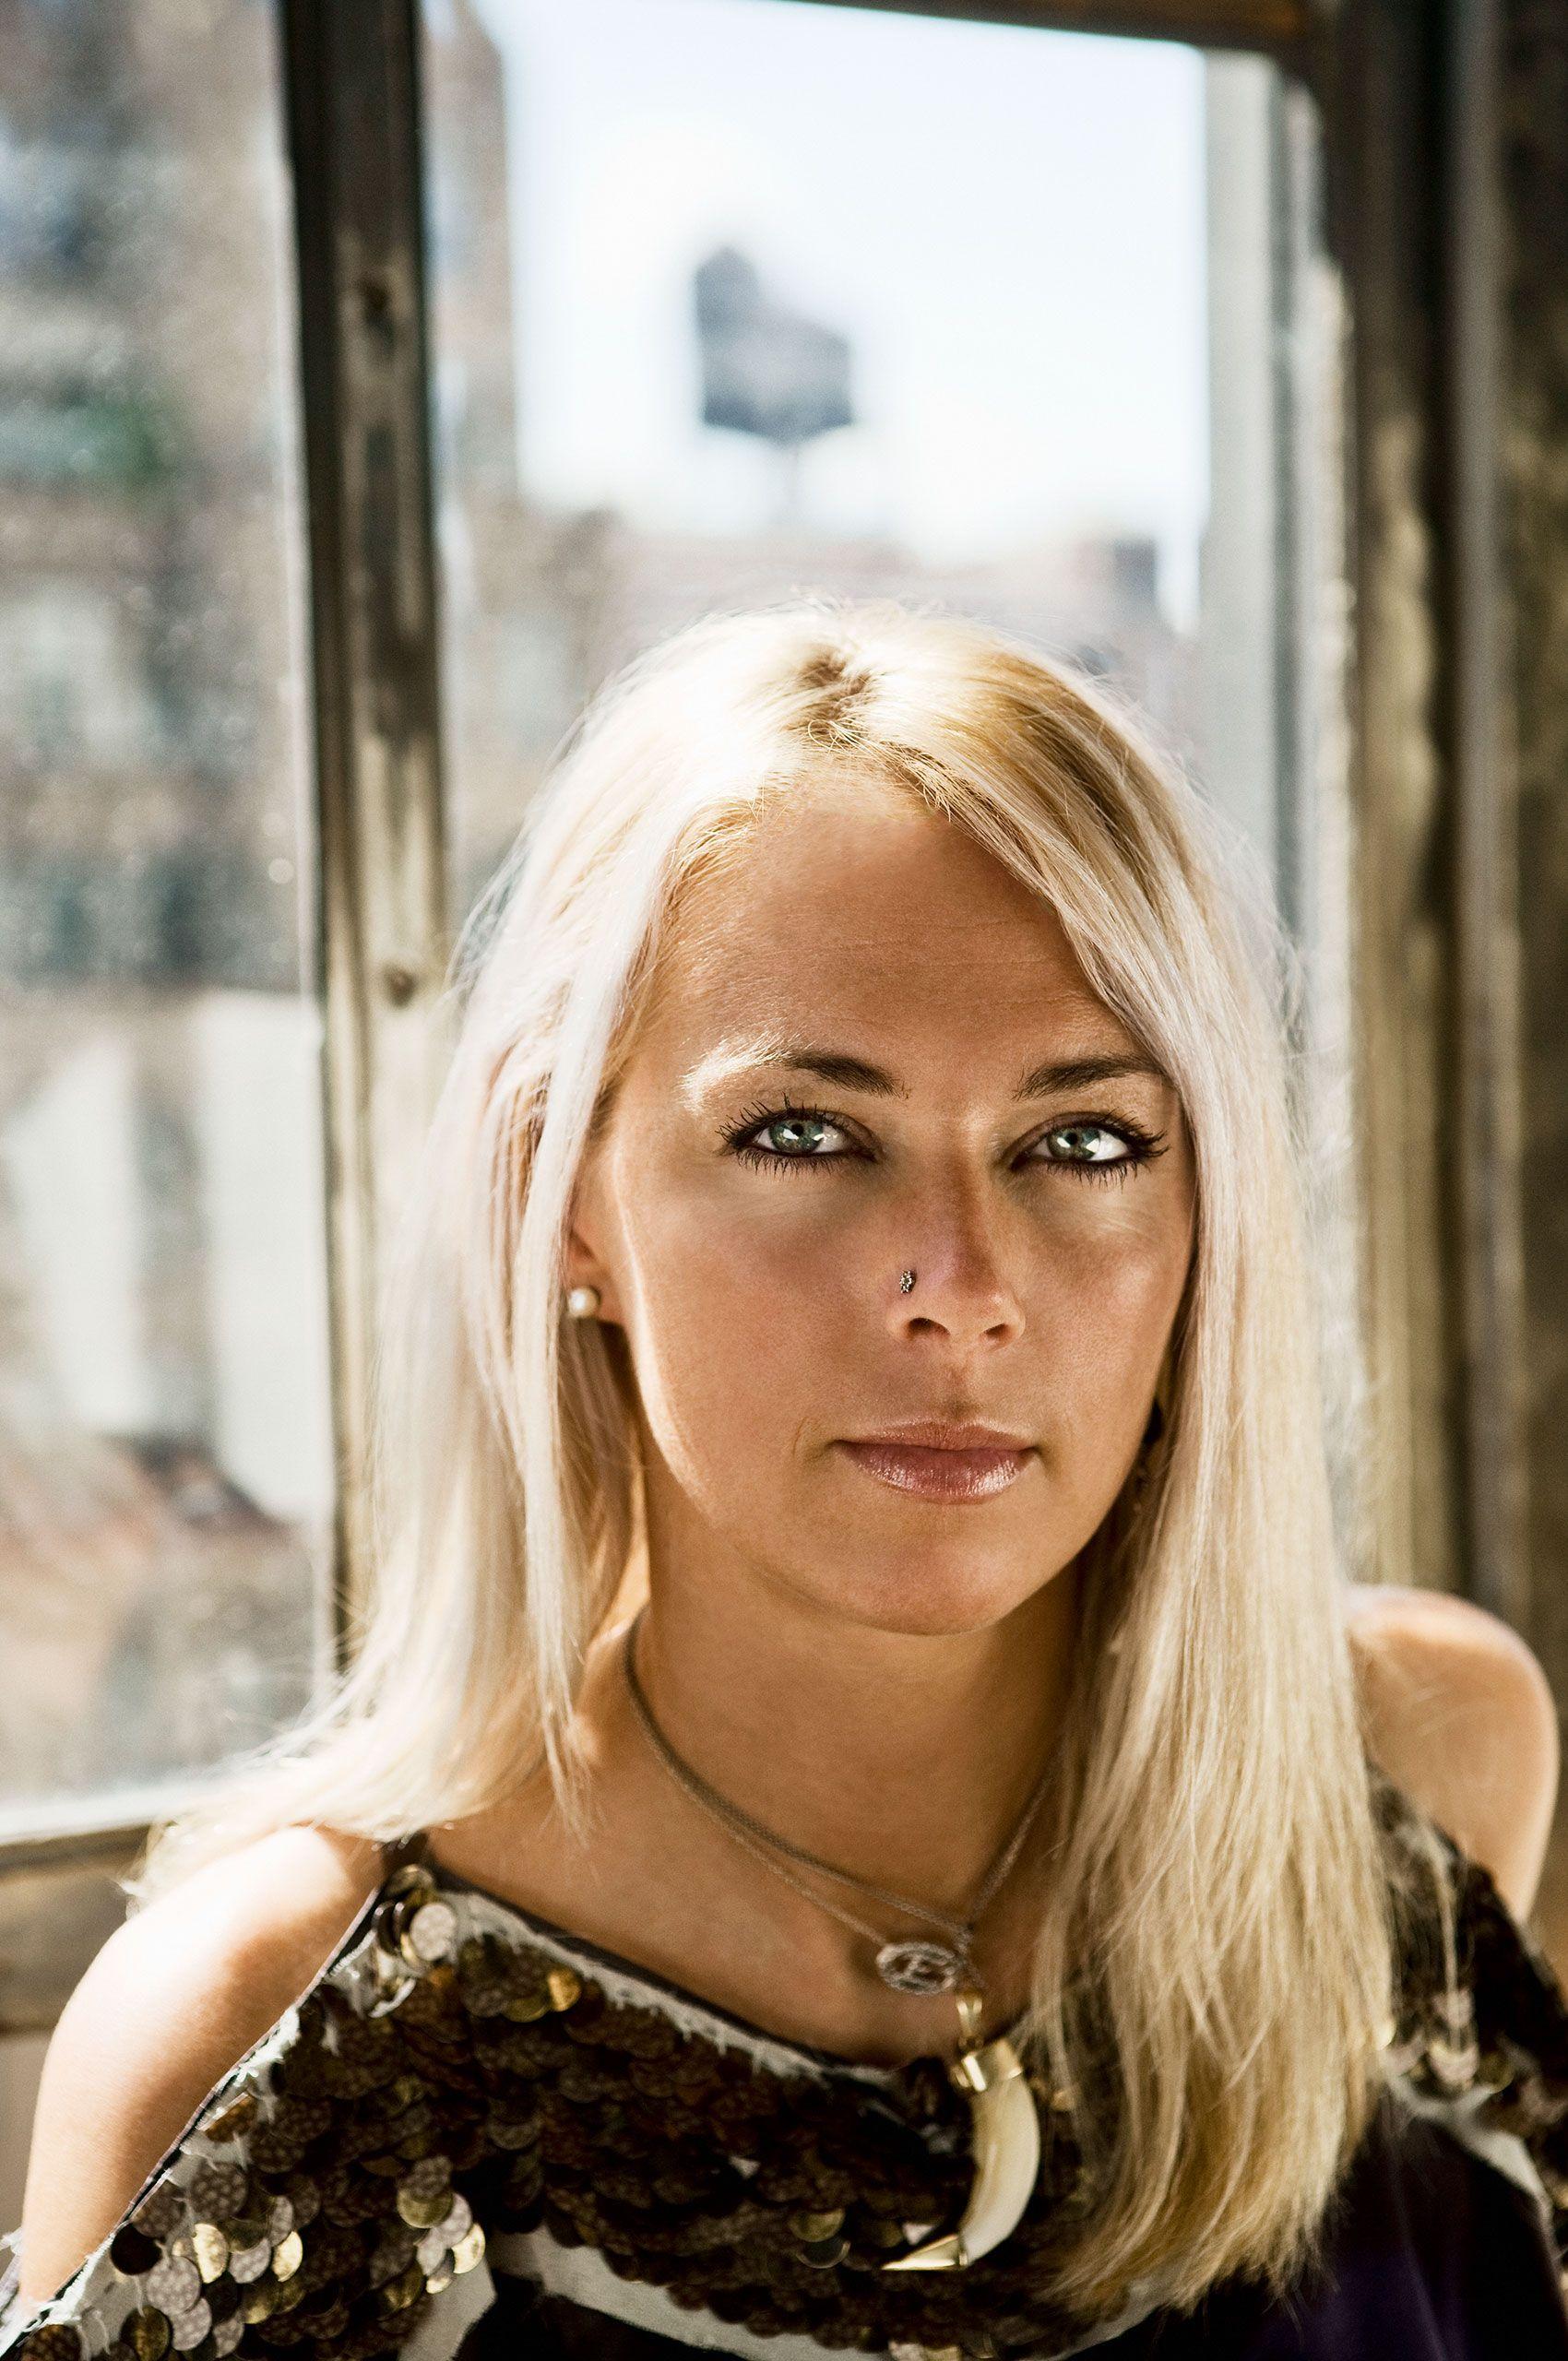 Elise-Overland-by-Henrik-Olund-Photography.jpg